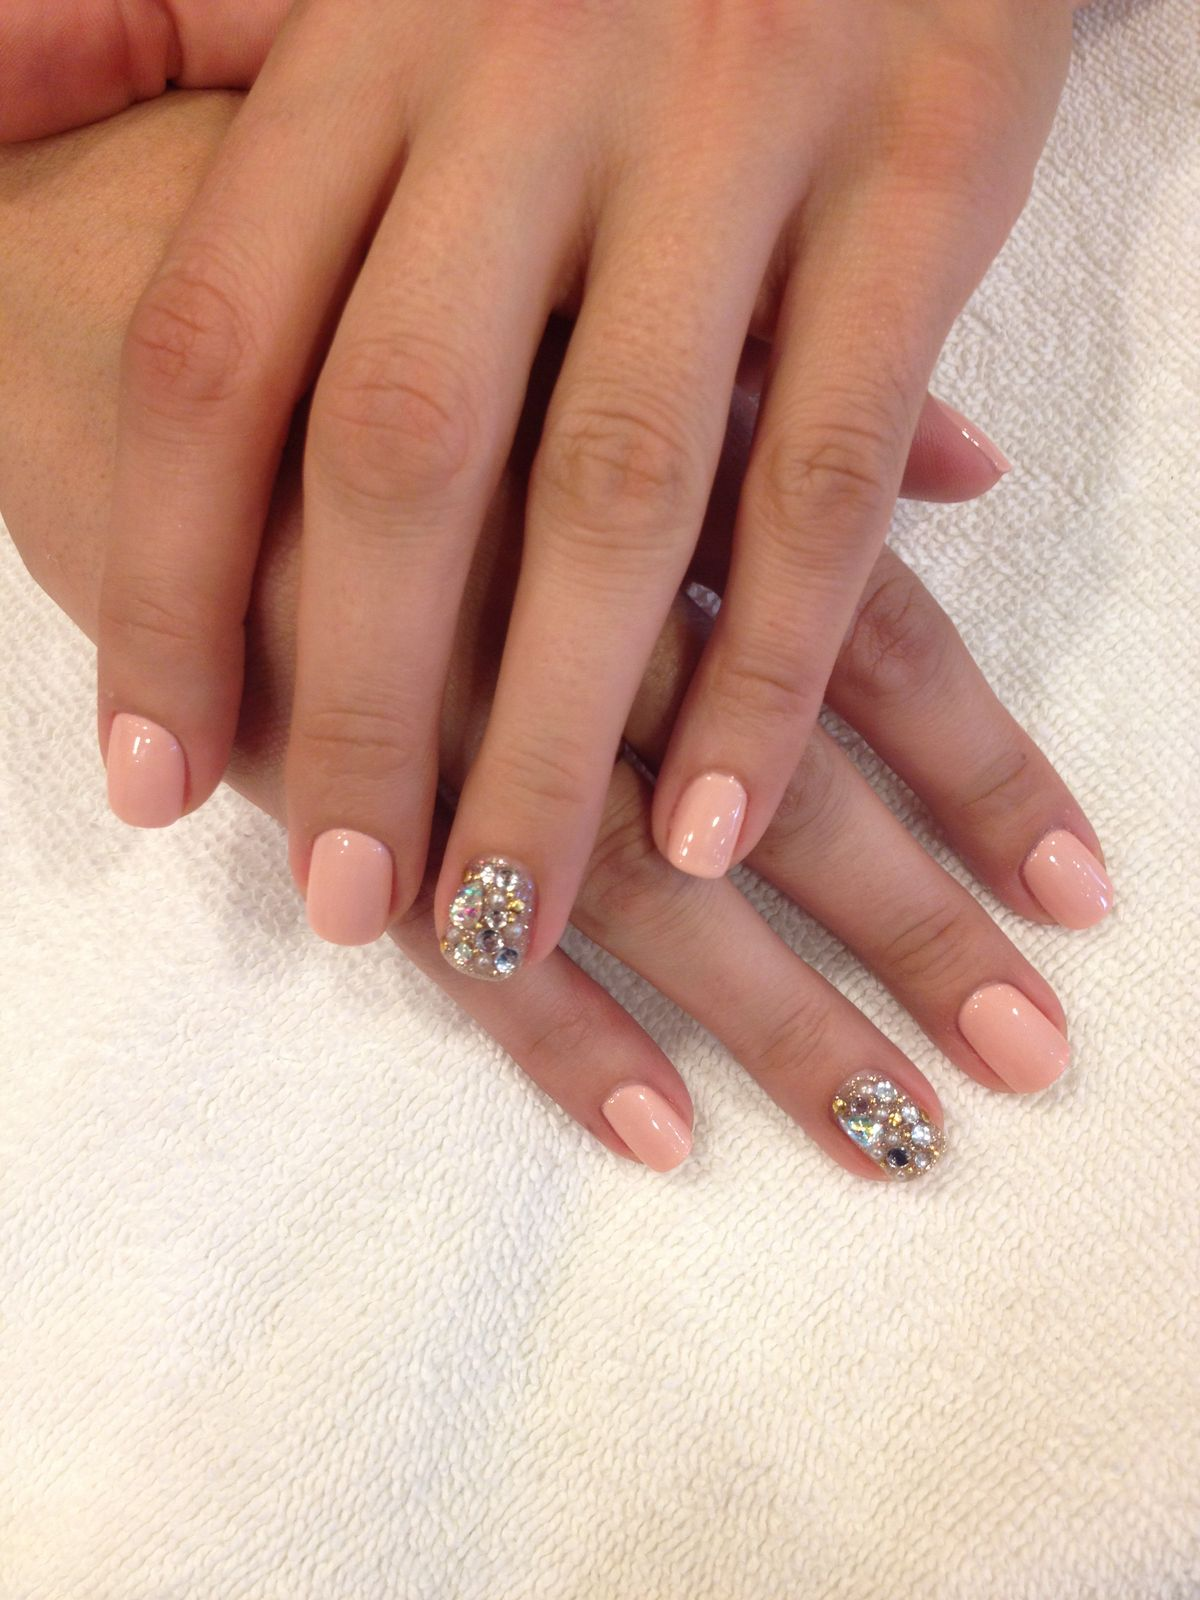 4k rhinestone nails wallpapers high quality download free - Nails wallpaper download ...